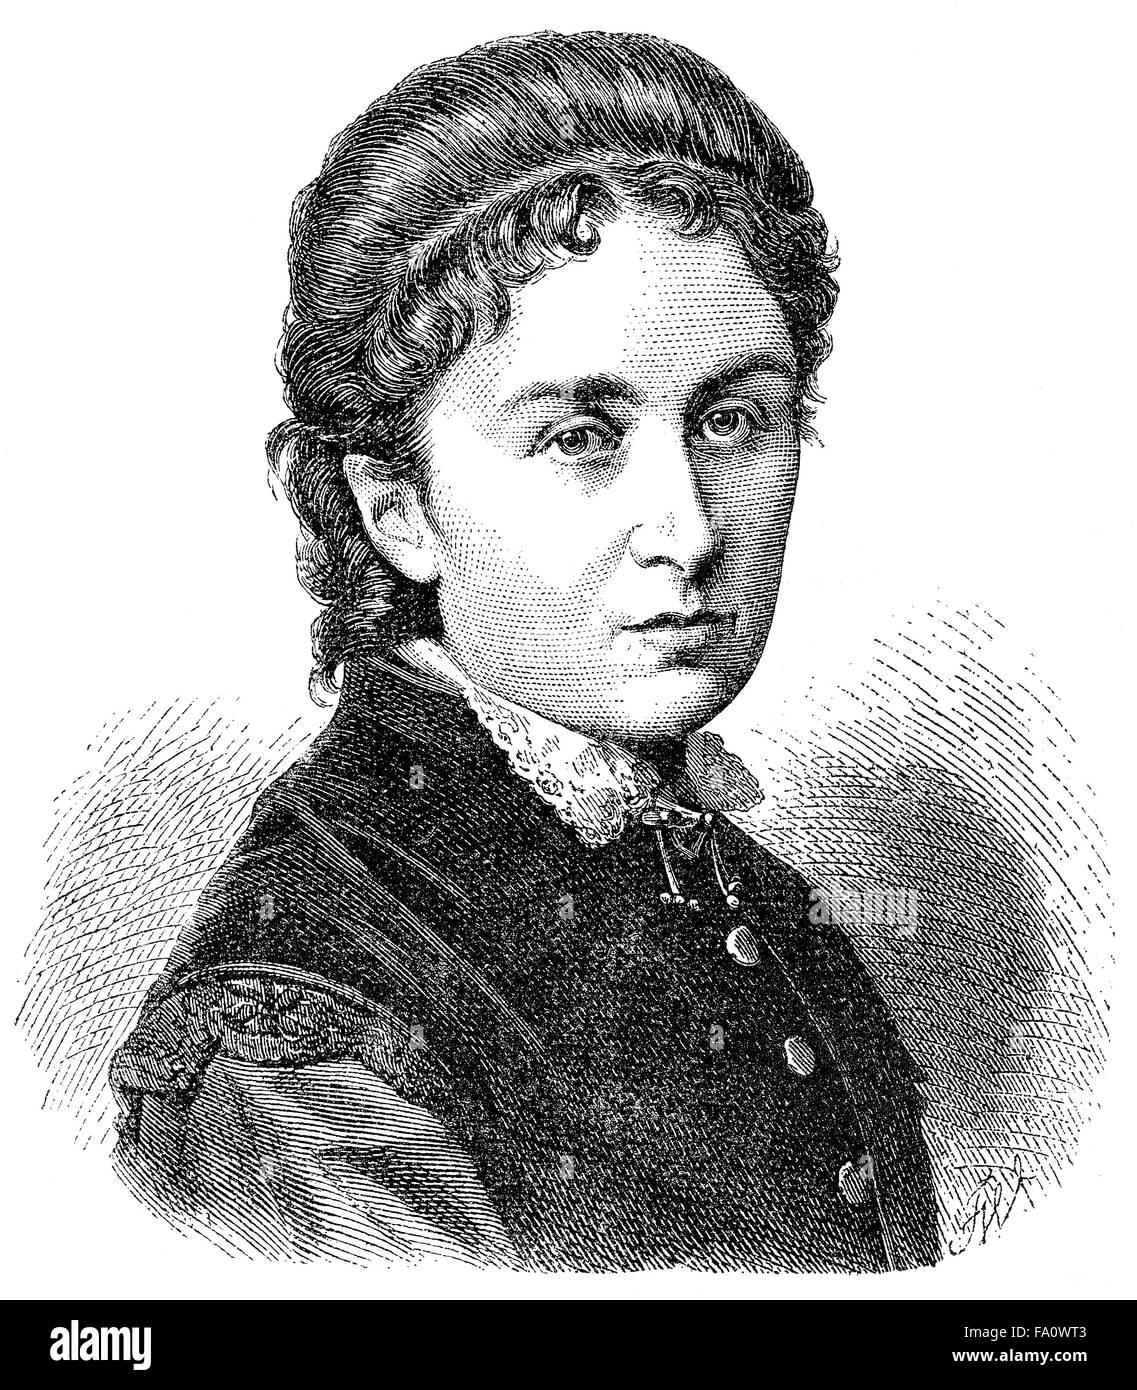 Klara Bauer, 1836-1876, Pseudonym Karl Detlef, German writer, - Stock Image